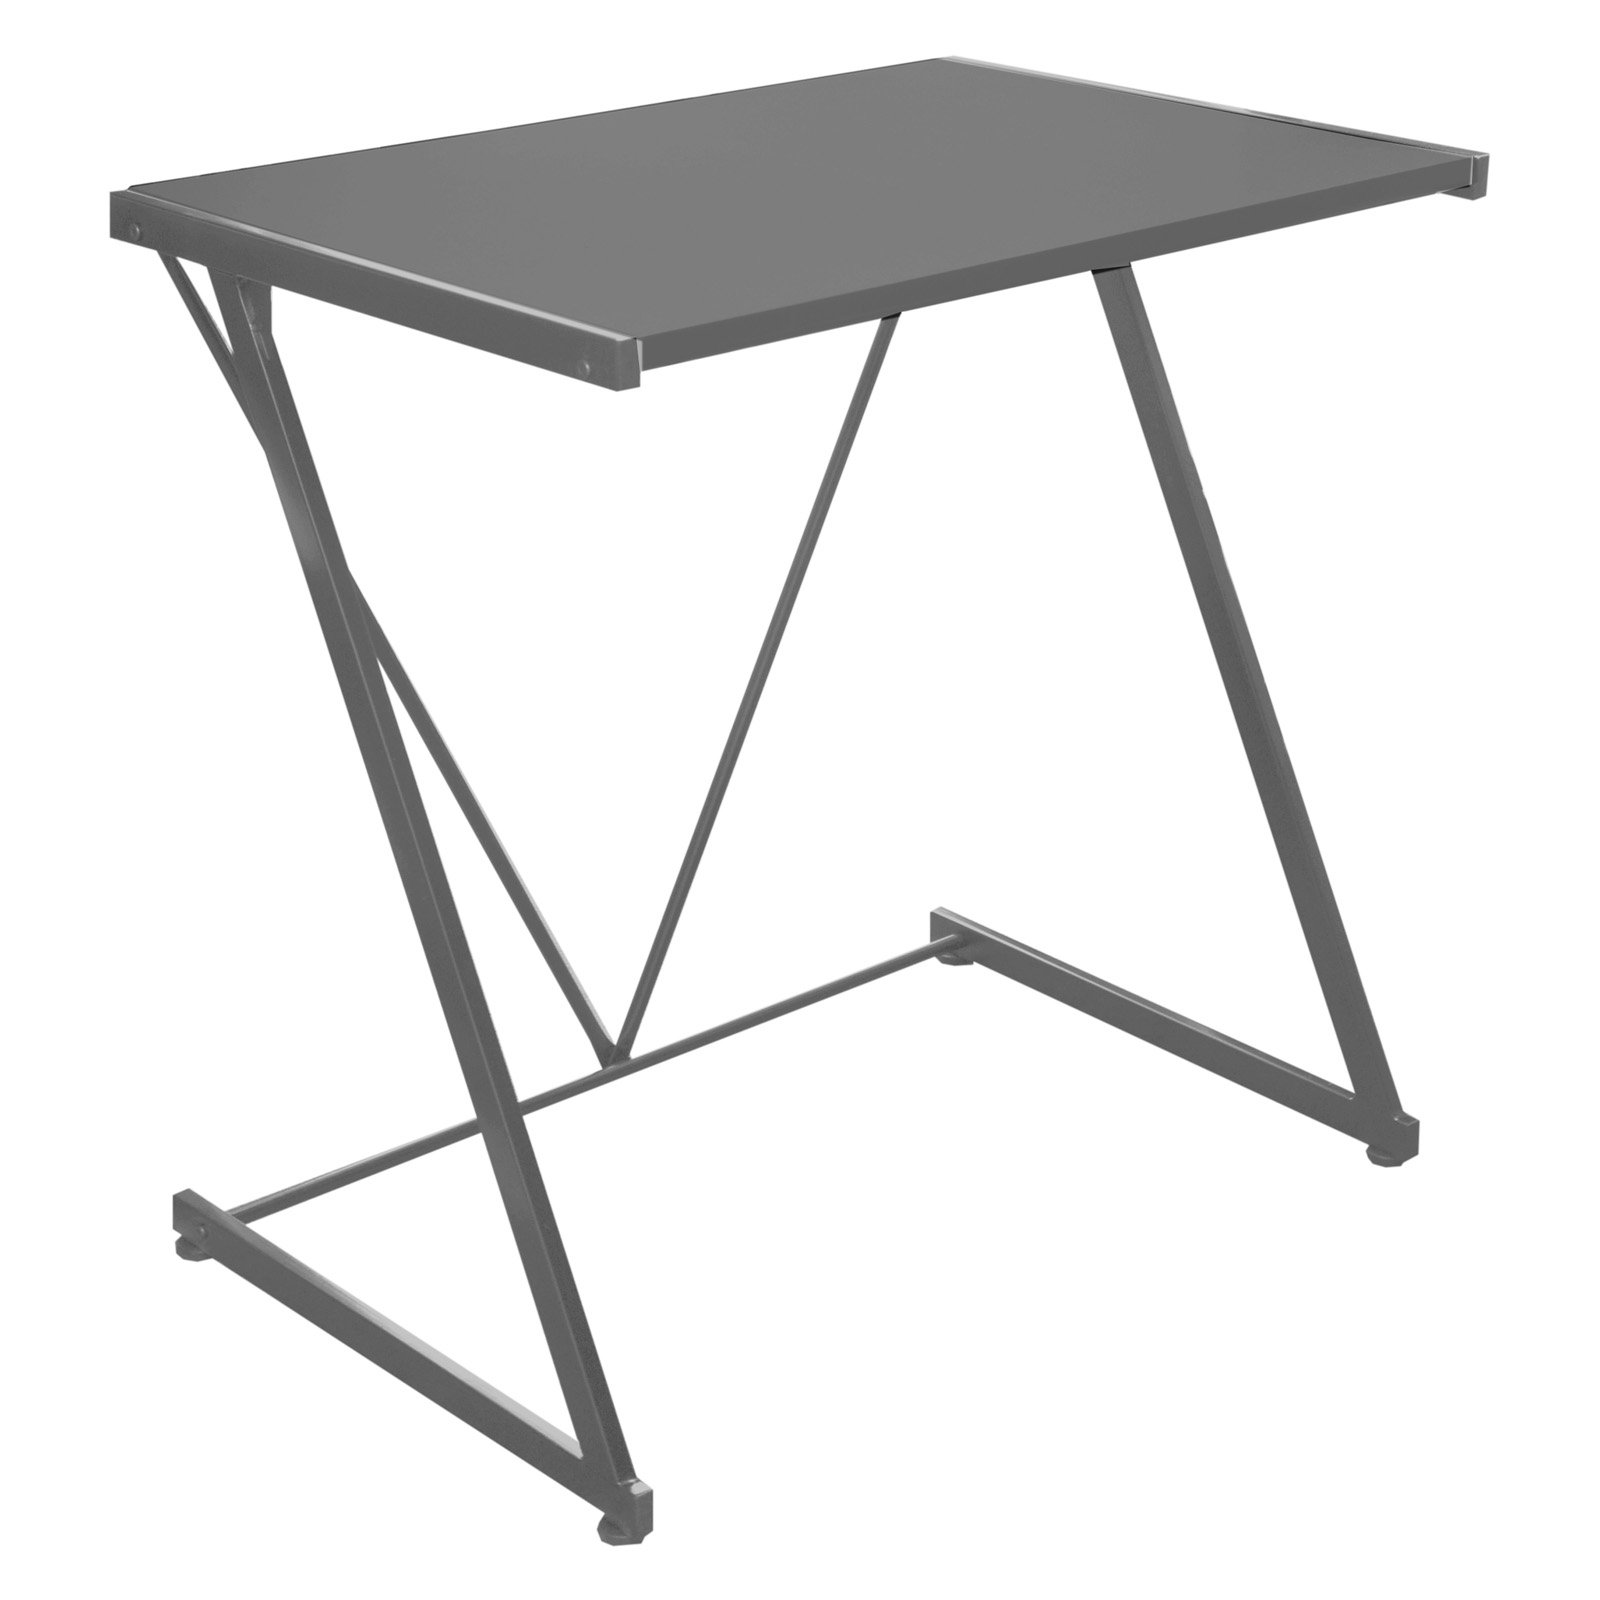 Urban Shop Z-Shaped Student Desk, Black - Walmart.com - Walmart.com